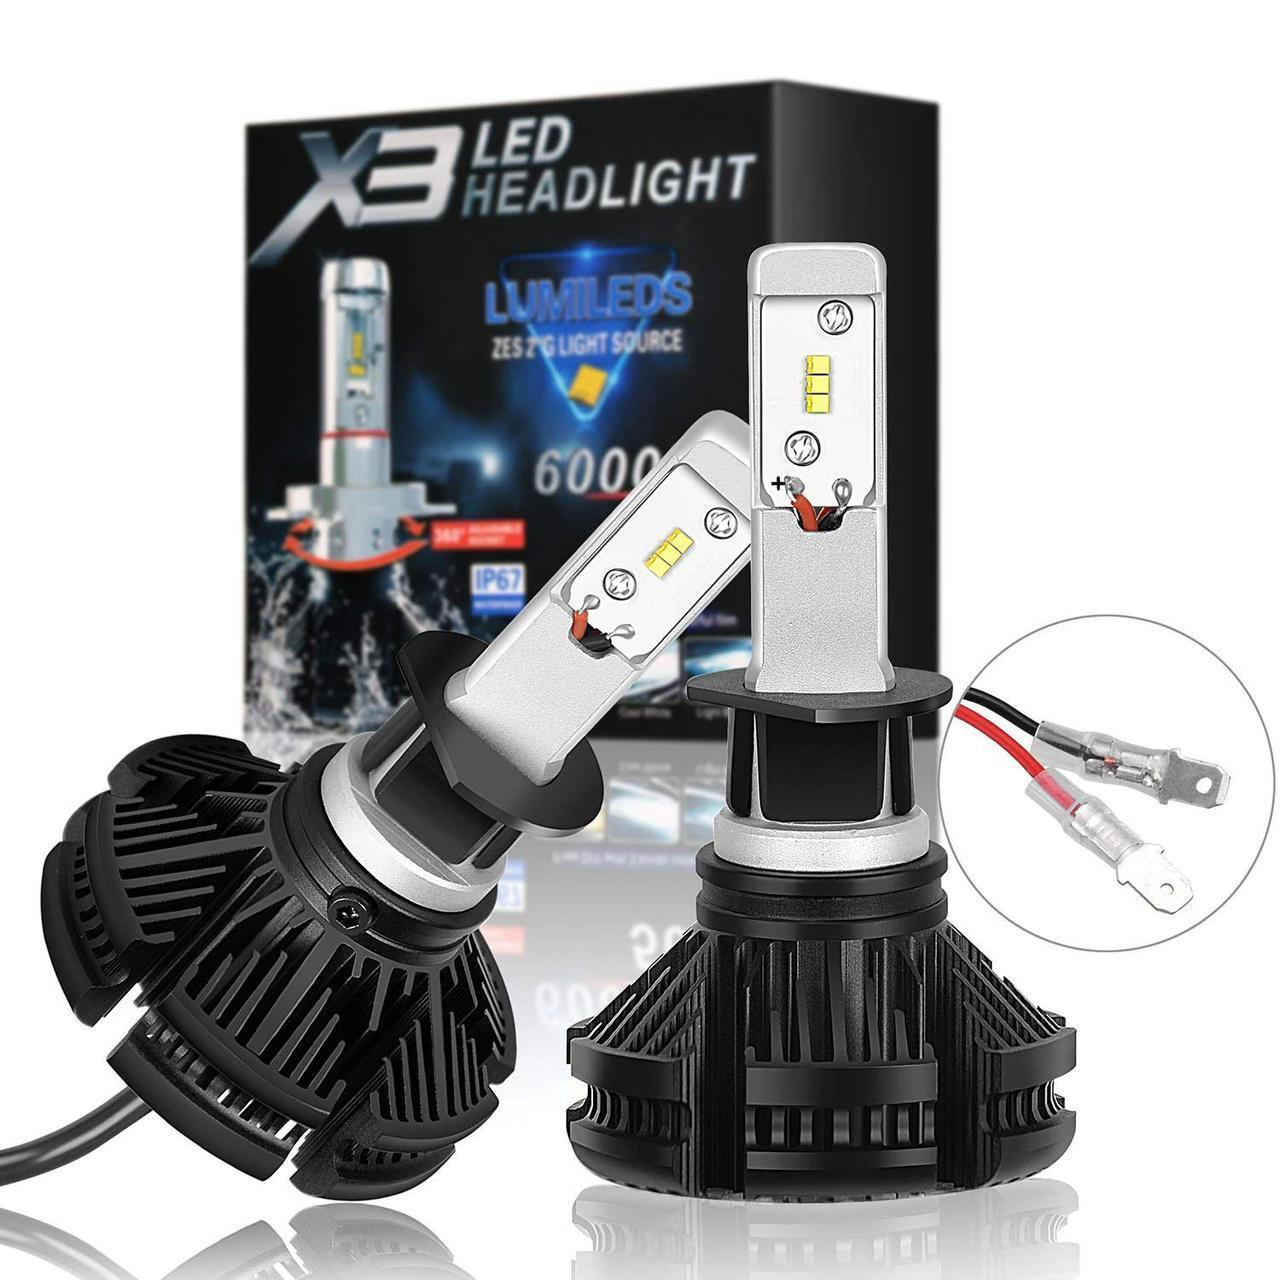 Комплект светодиодных ламп головного света LED X3-H11 15 ксенон Xenon X3-H11 15 LED